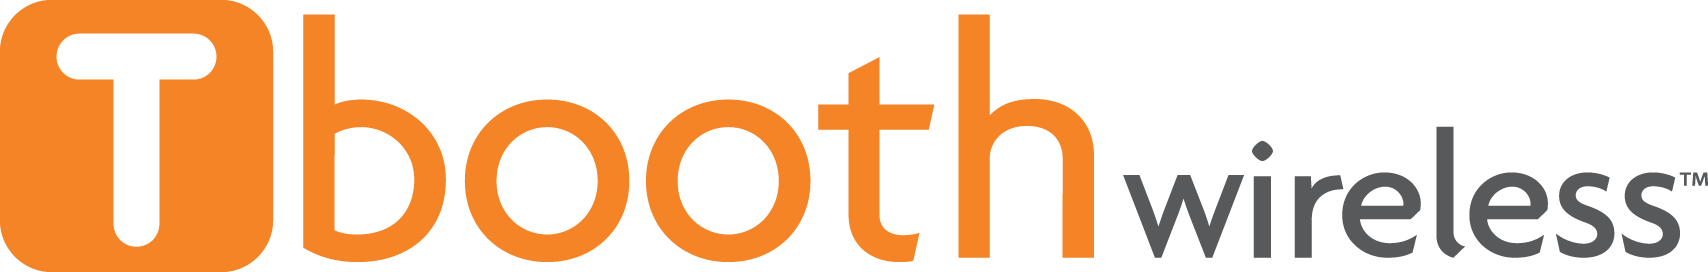 Glentel - Tbooth